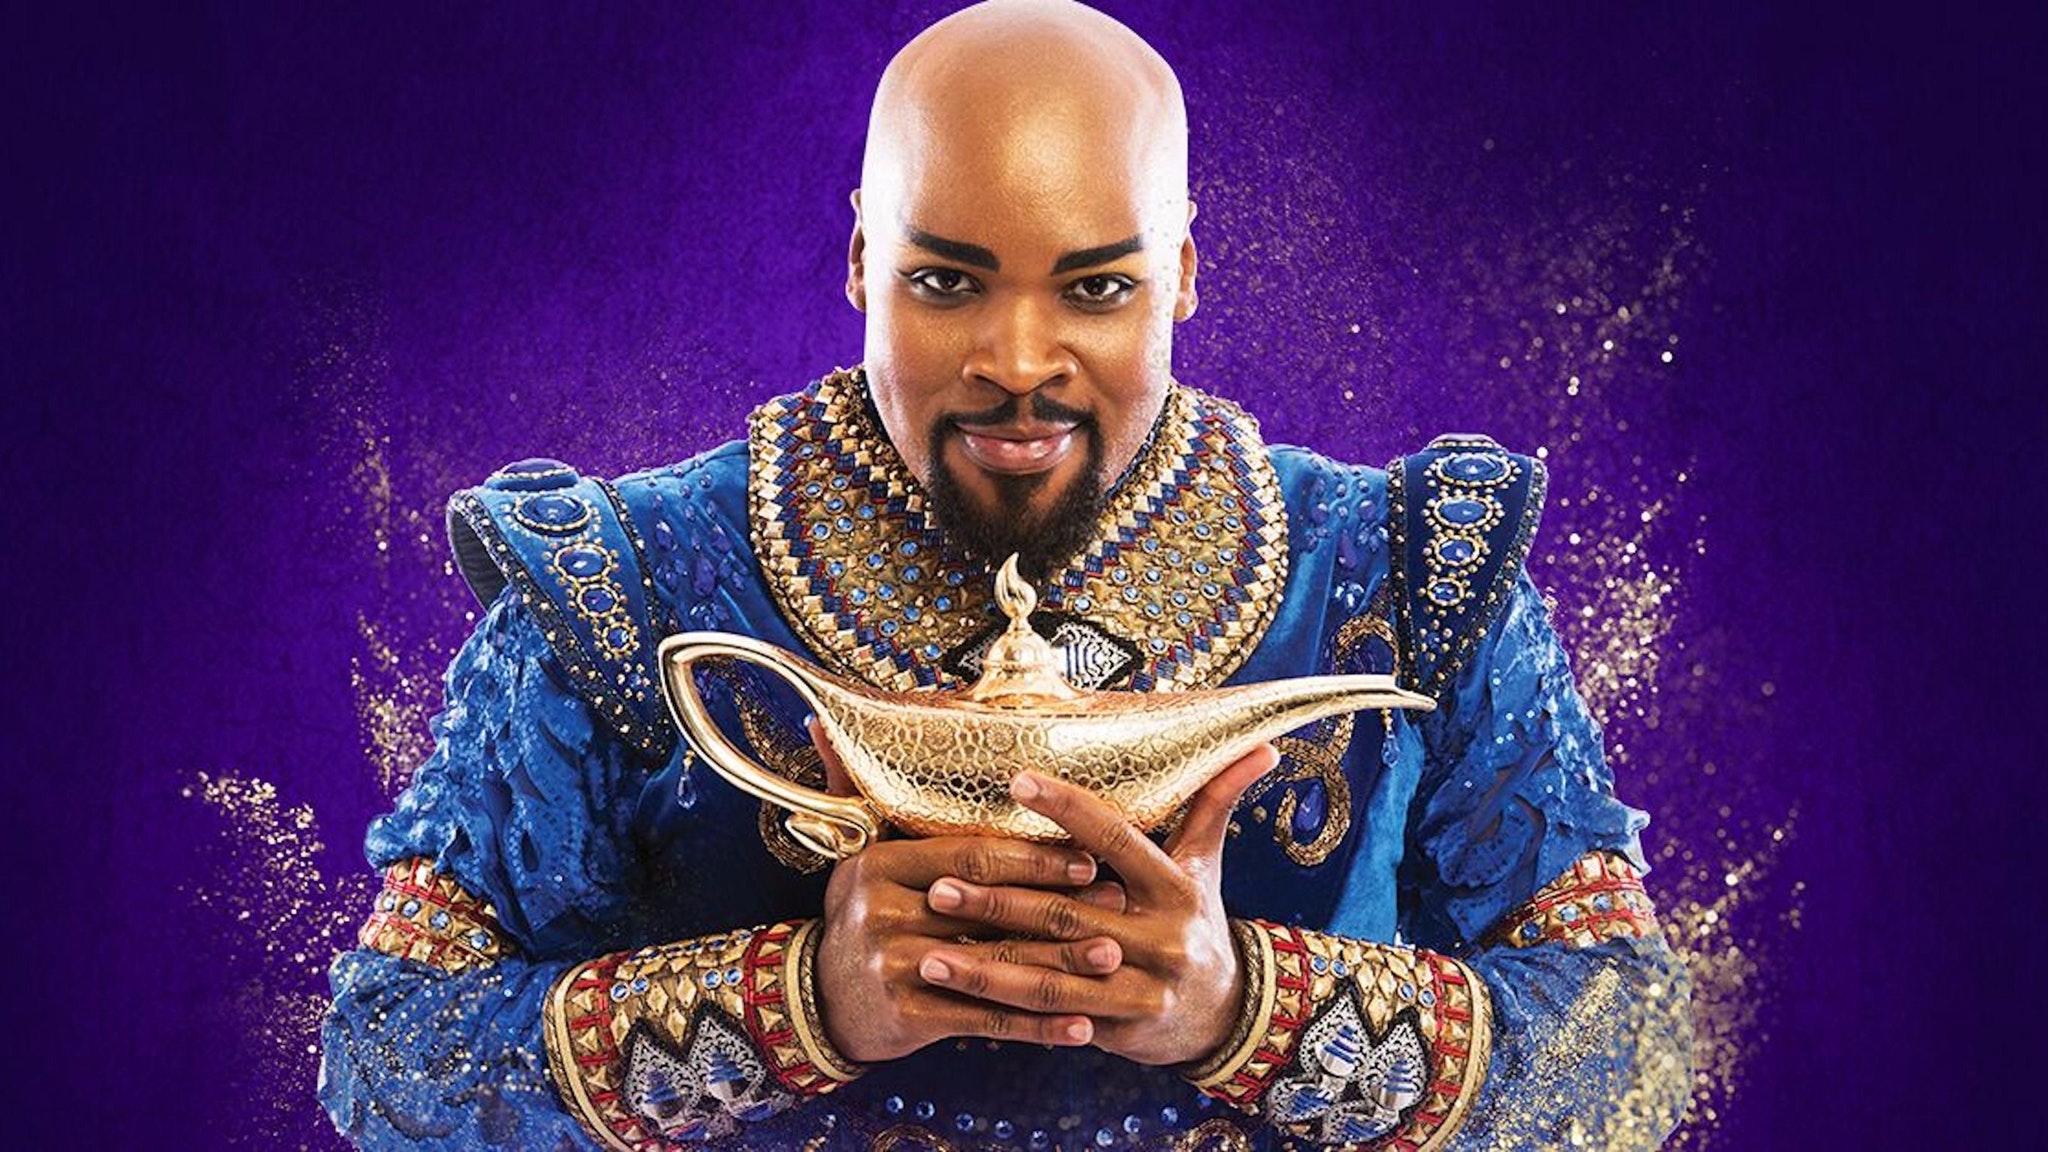 Disney's Aladdin - The Hit Broadway Musical